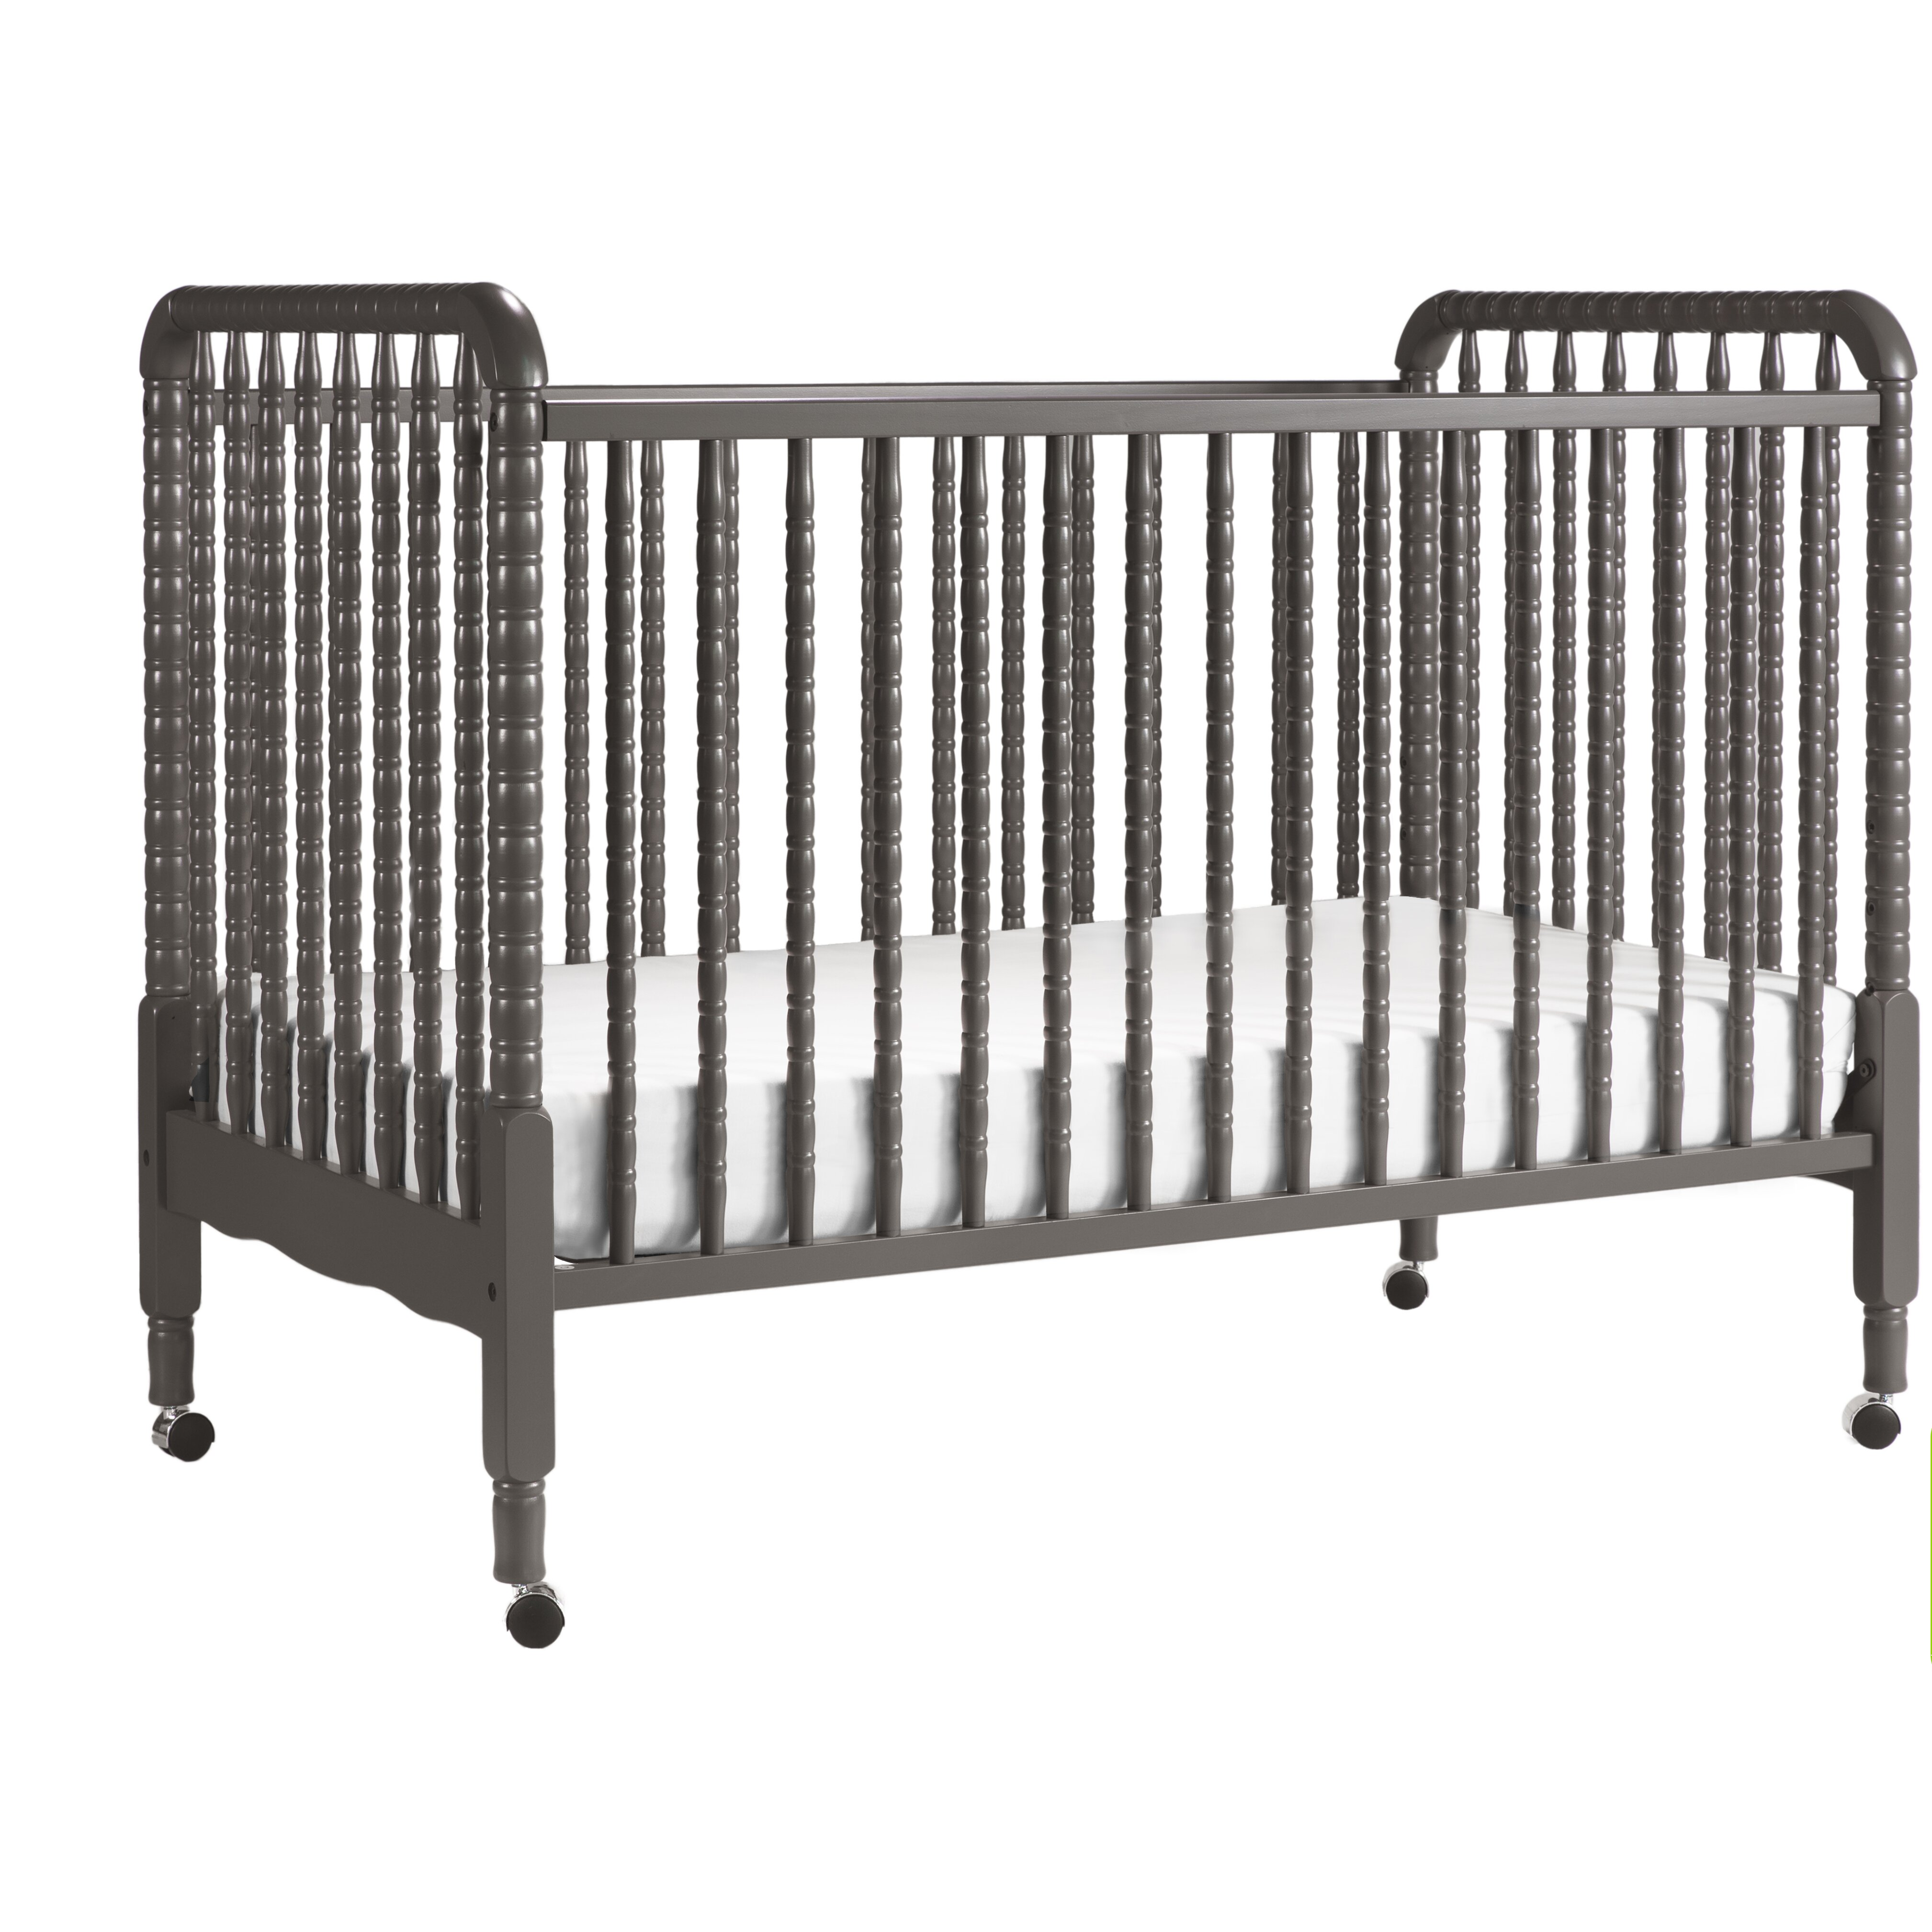 Crib for sale tarlac - Davinci Jenny Lind 3 In 1 Convertible Crib